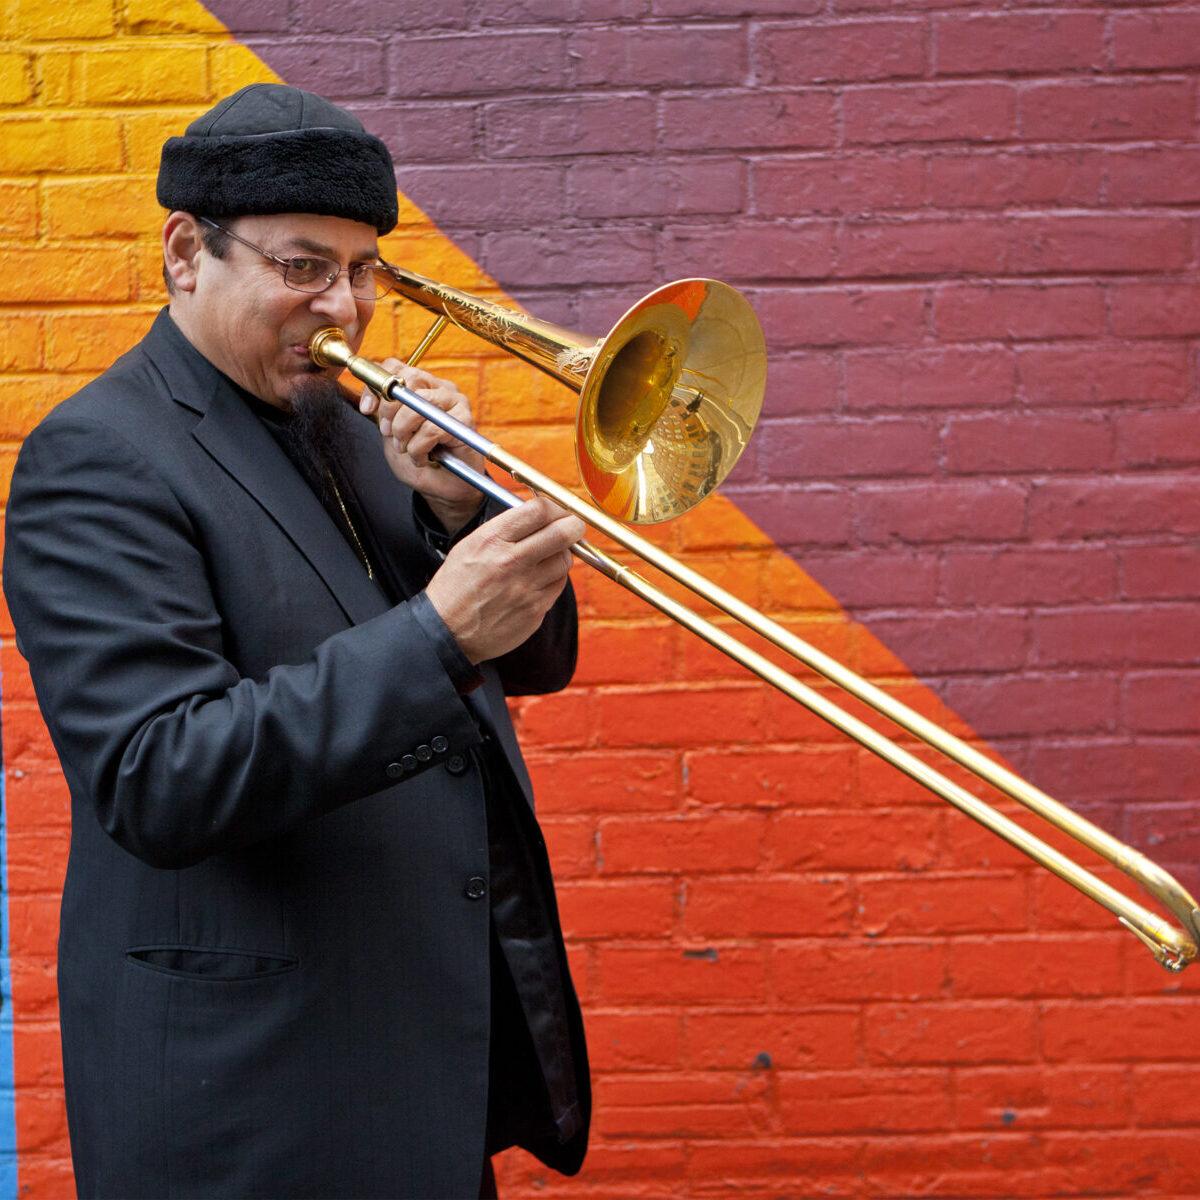 Steve Turre Smoke Sessions Jazz New York Trombone Brooklyn Bridge - May 3, 2016 ©John Abbott www.johnabbottphoto.com, 212-765-2342